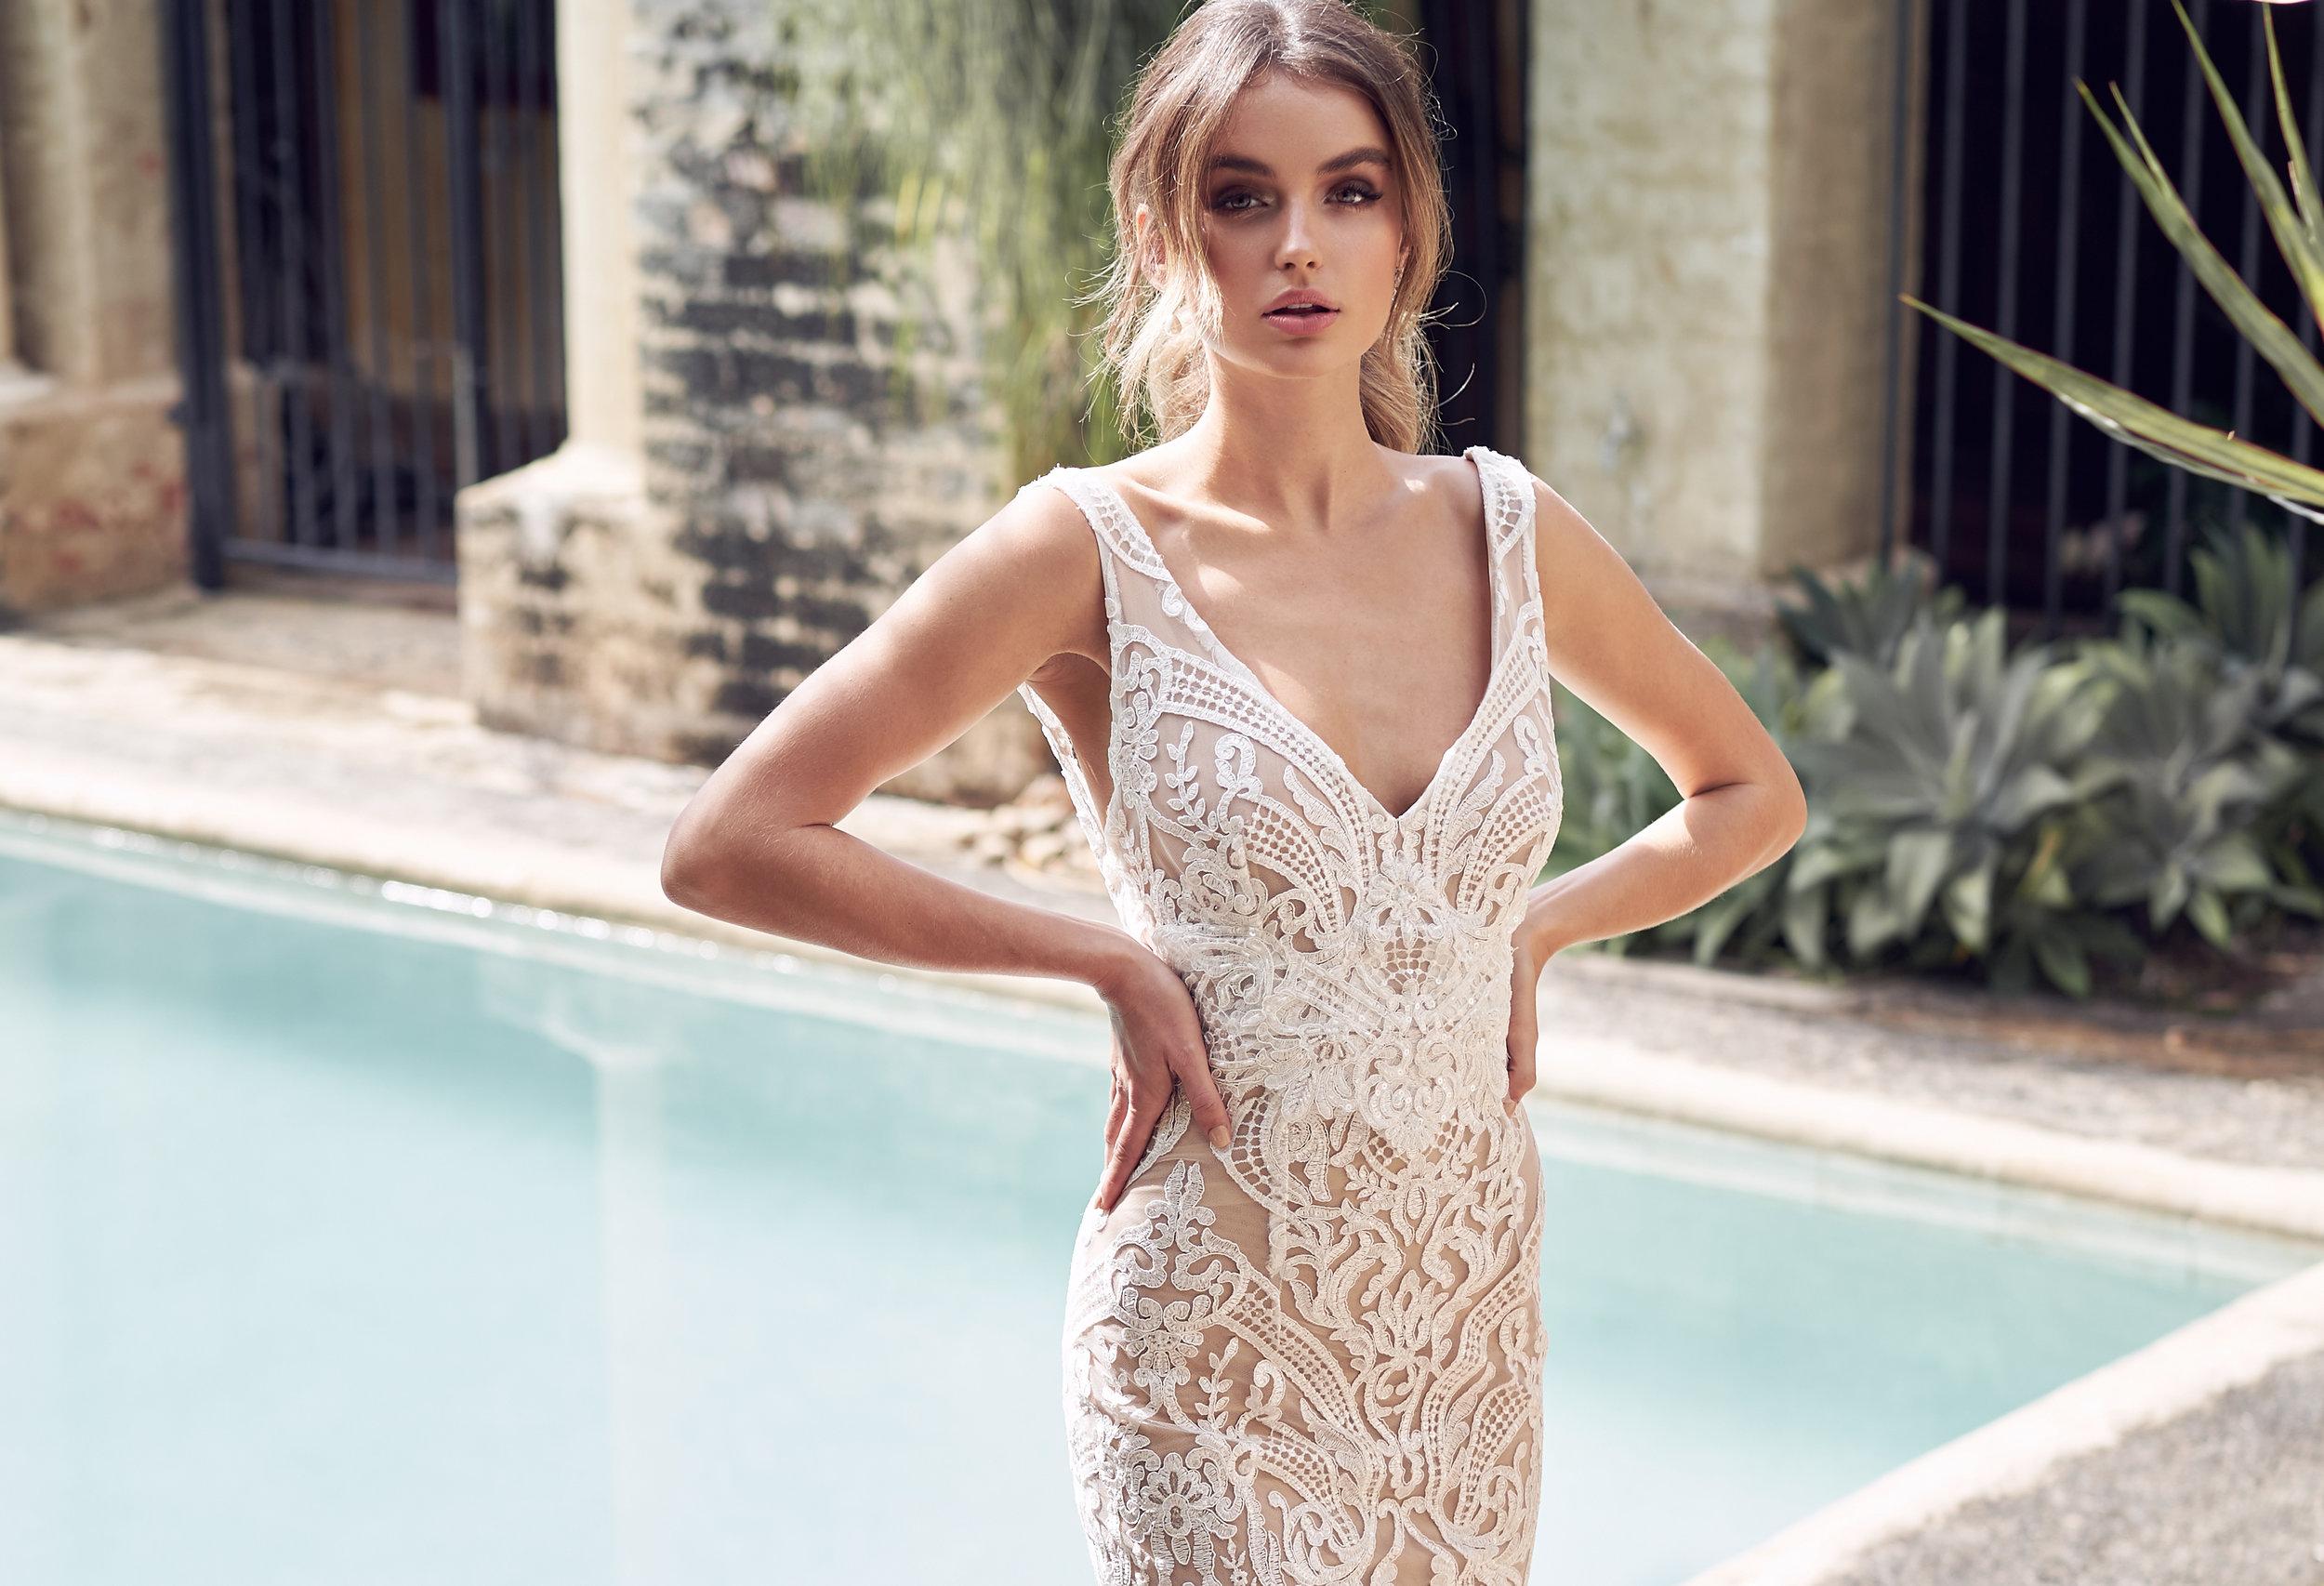 Anna+Campbell+Bridal+_+Jamie+Dress+_+2019+Wanderlust+Bridal+Collection.jpeg